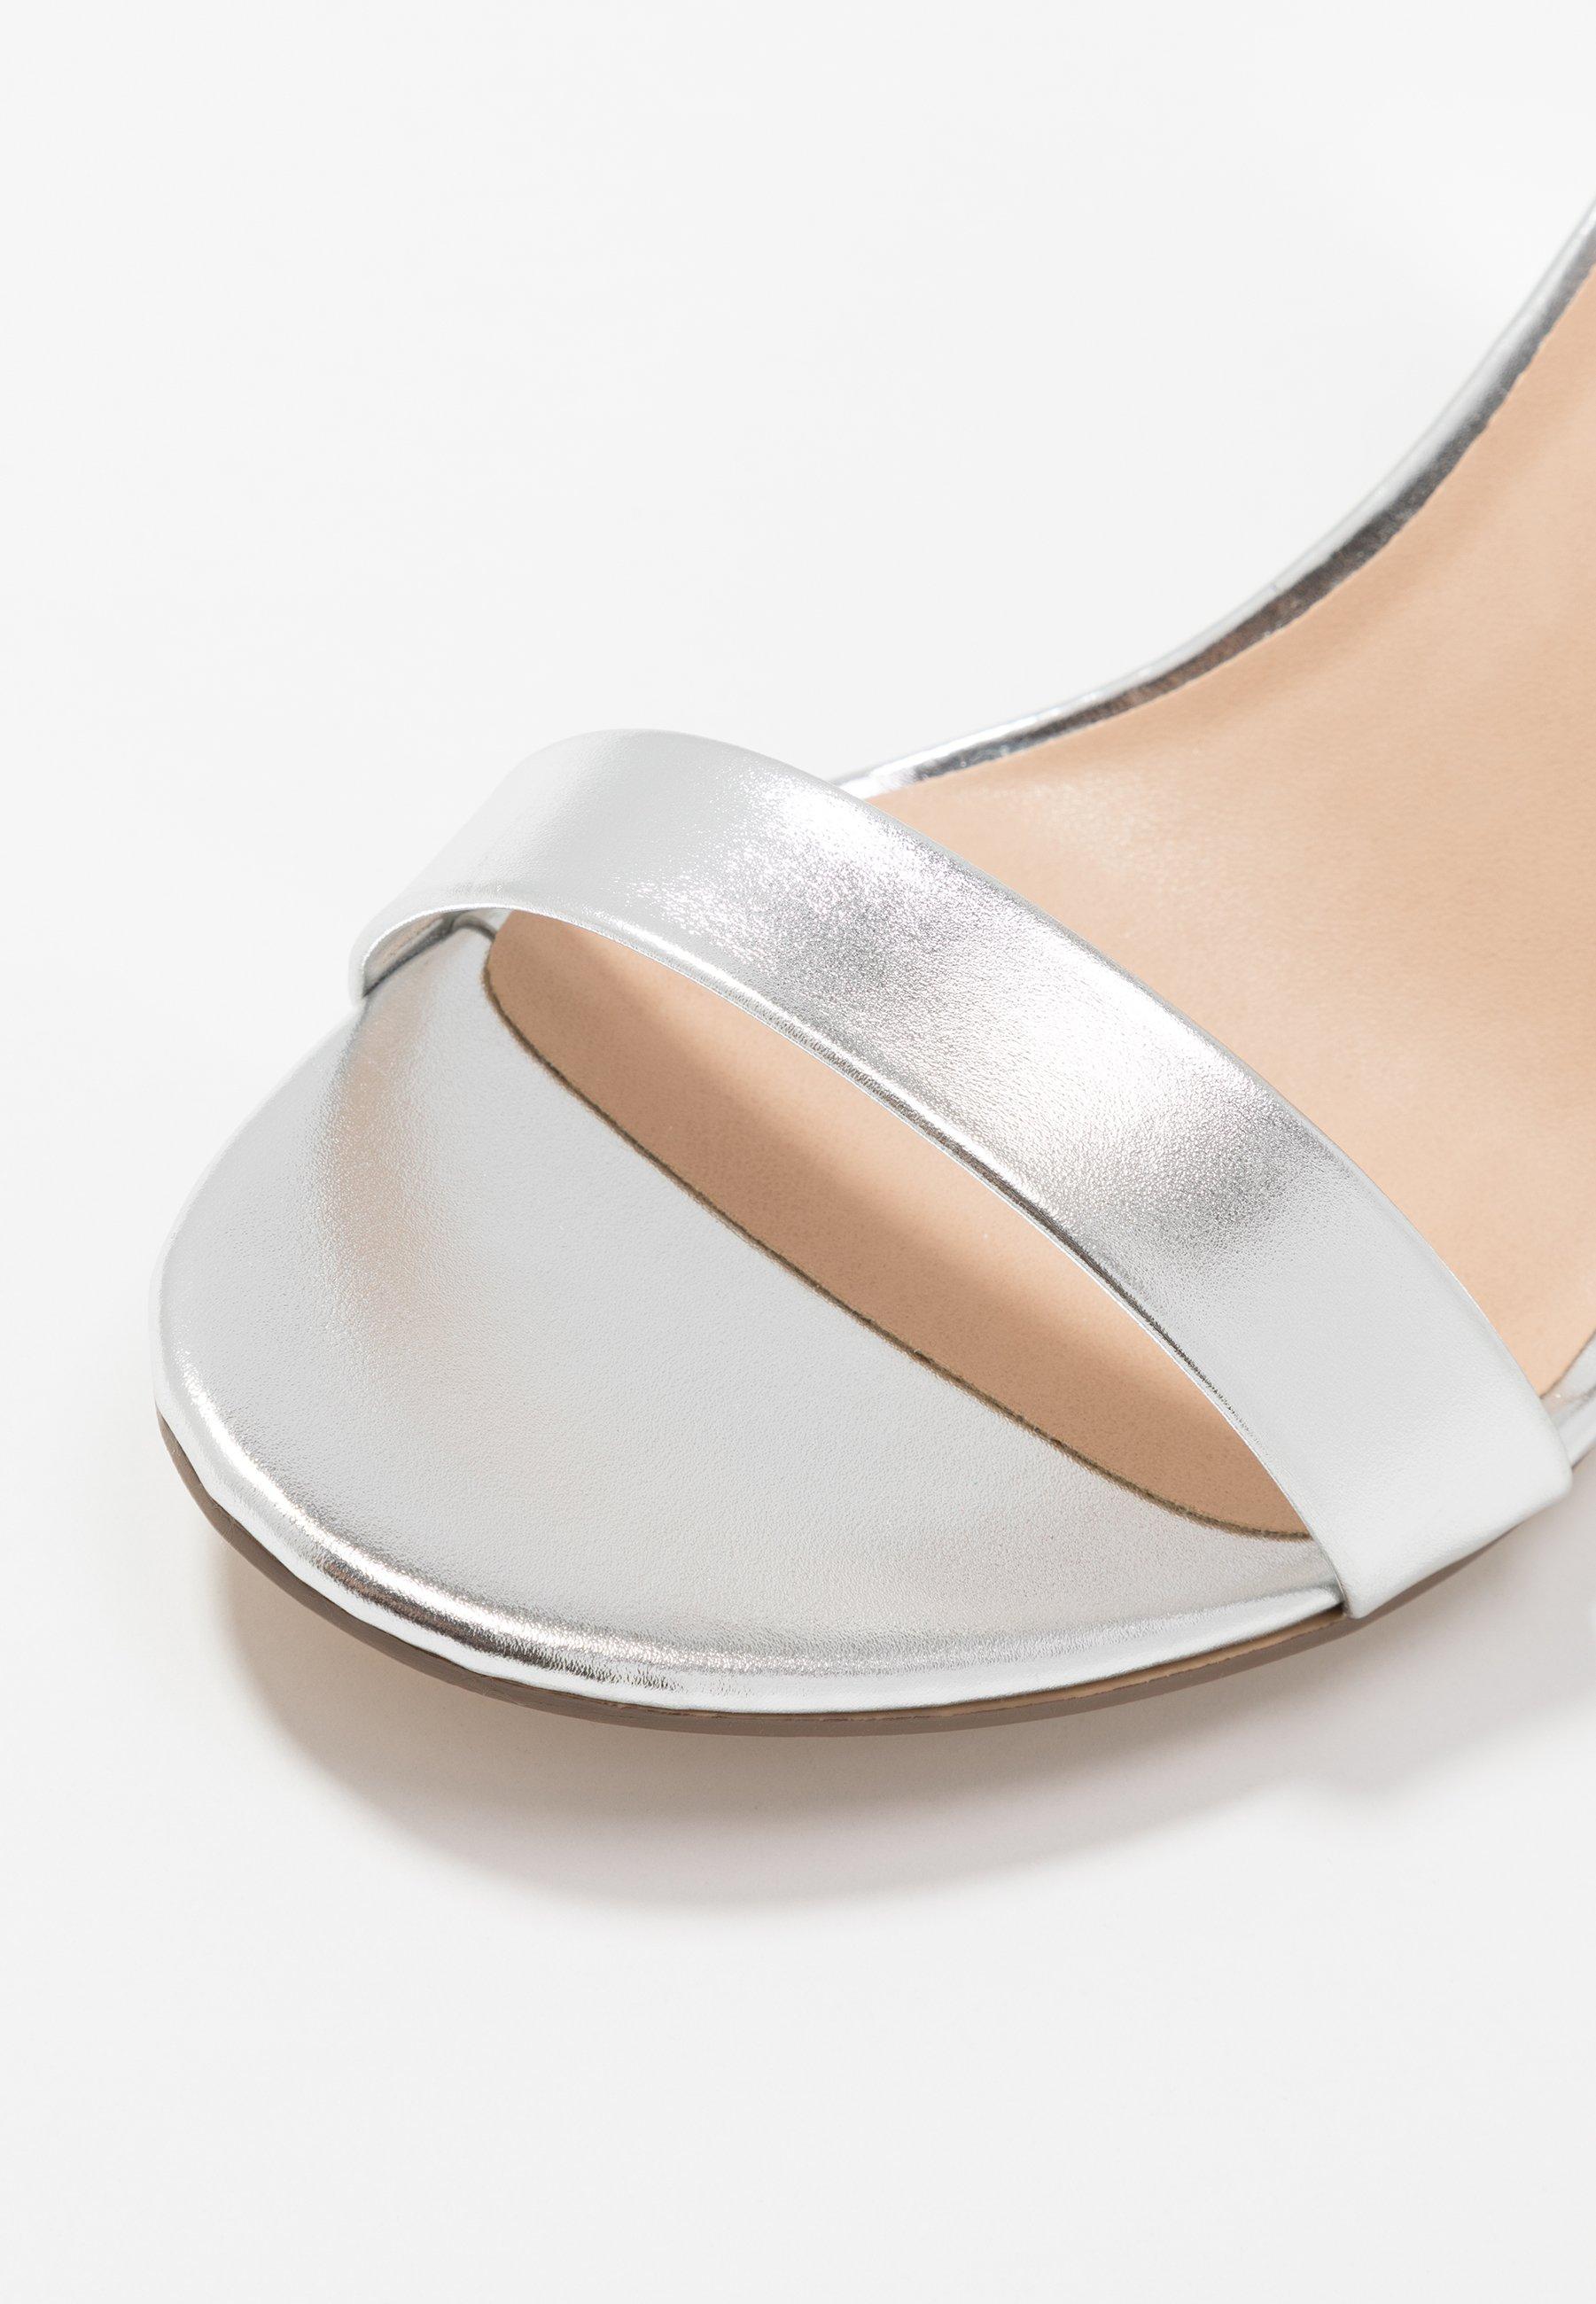 Dorothy Perkins Shimmer Block Heel - Sandales À Talons Hauts Silver